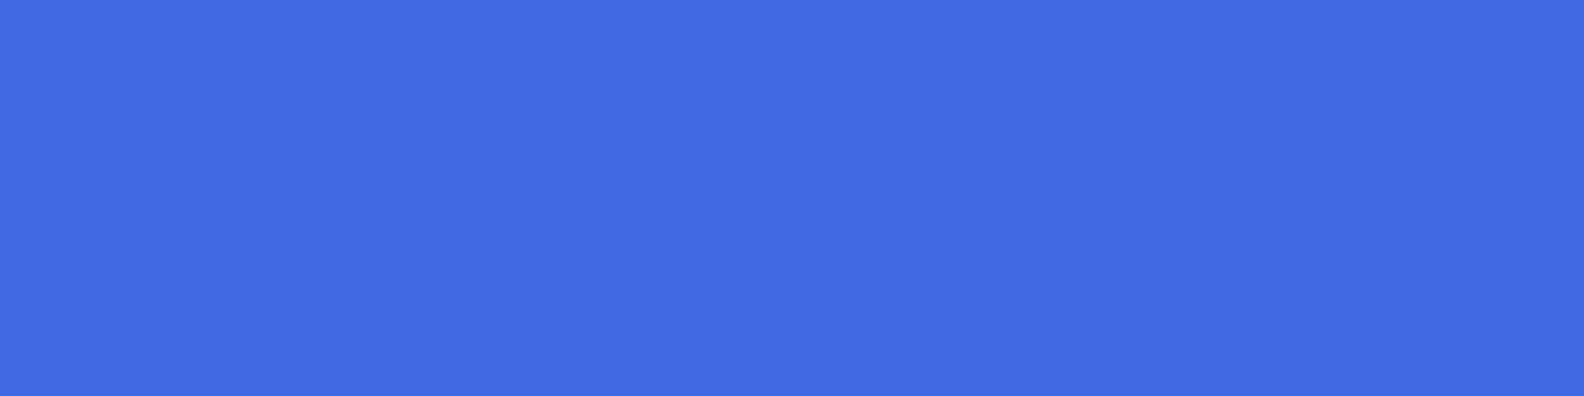 1584x396 Royal Blue Web Solid Color Background